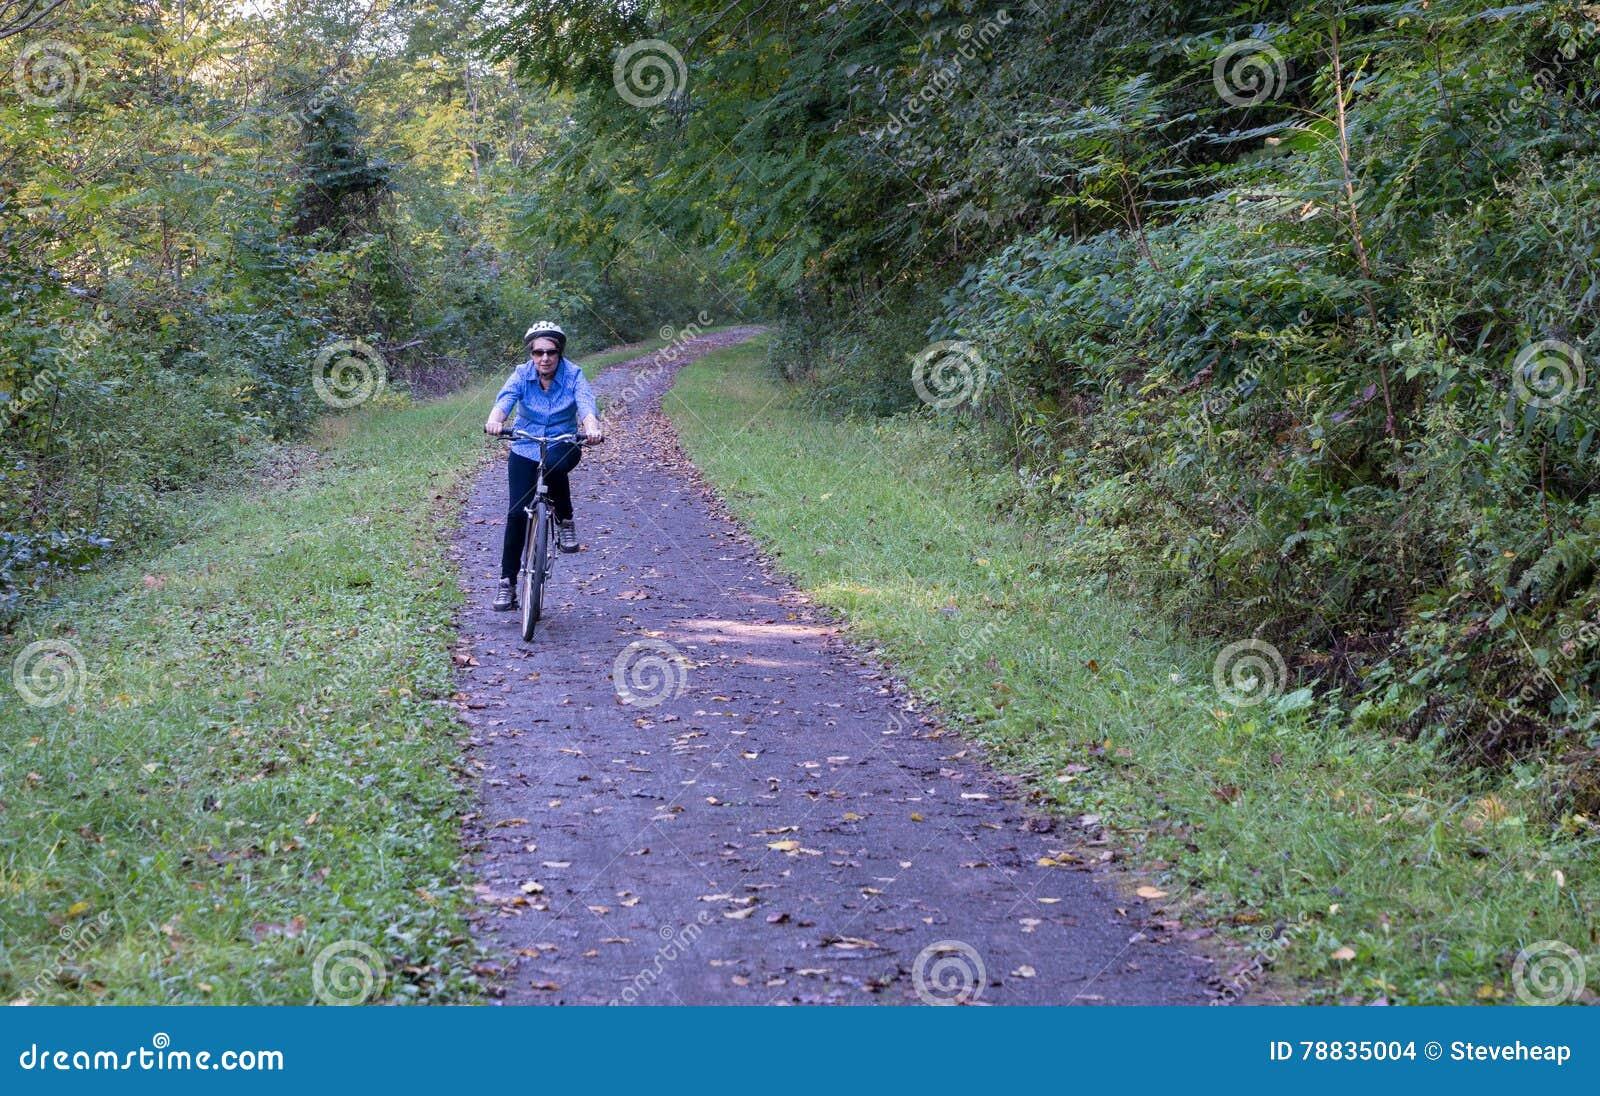 Senior adult woman cycles towards camera